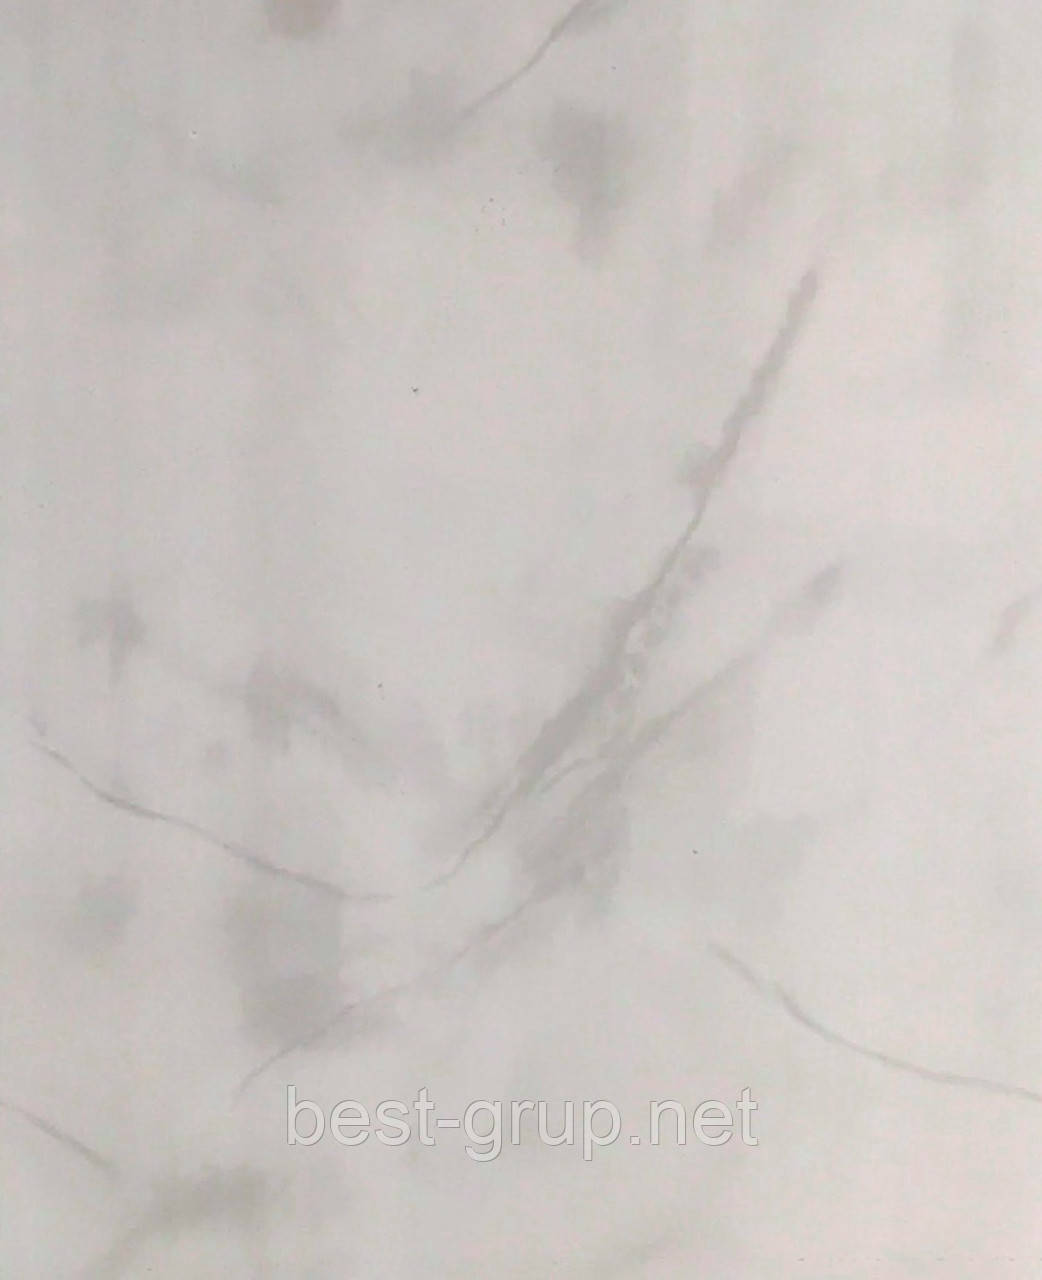 Оникс серый (250х6000х8мм) - Панели ПВХ Panelit (Панелит)